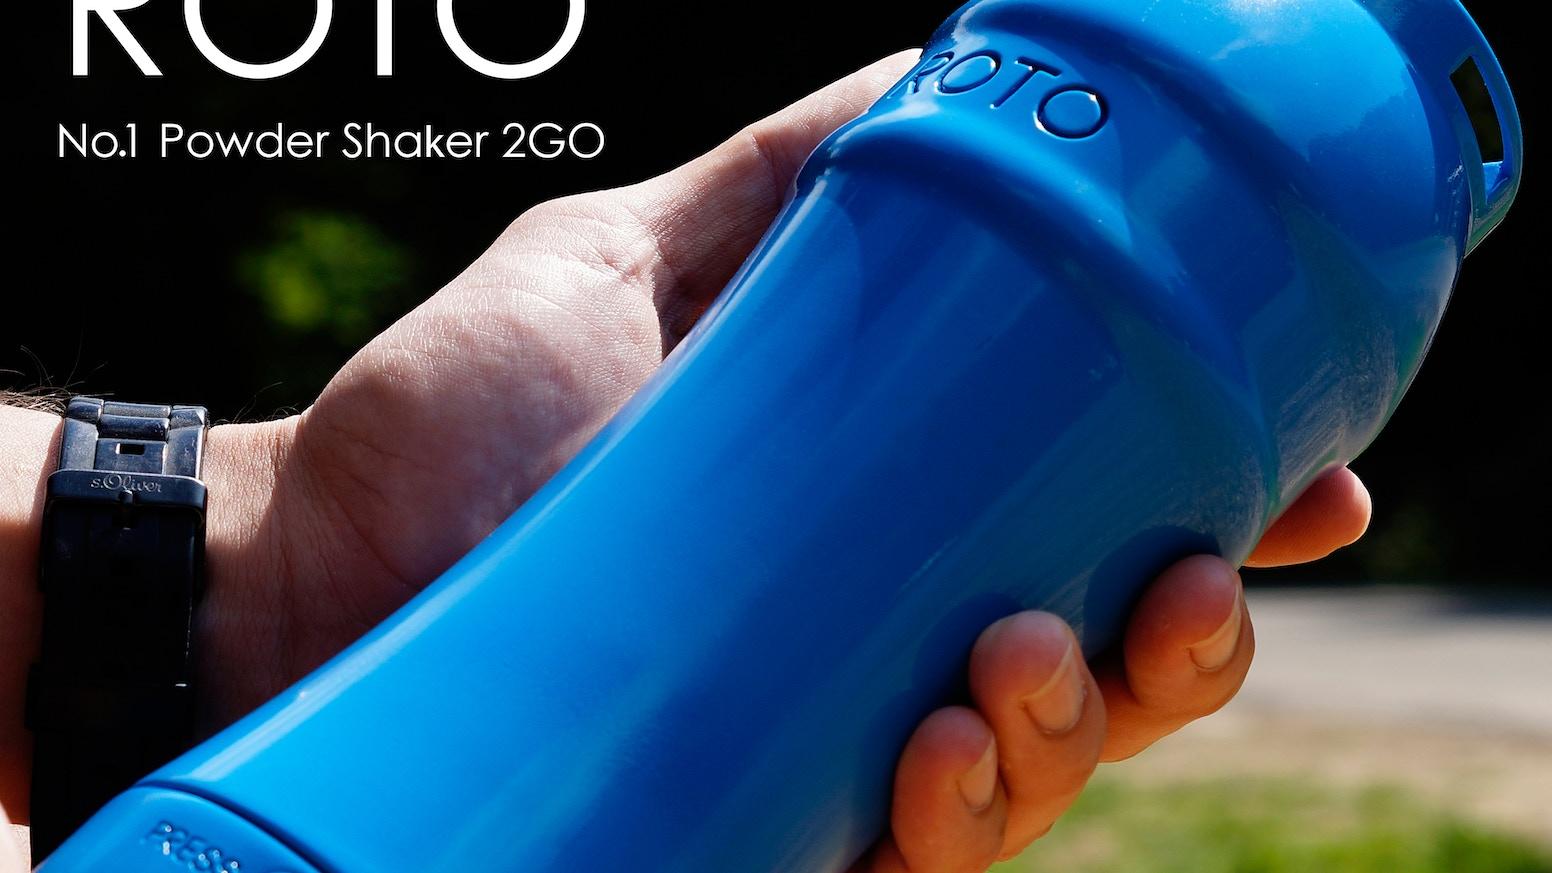 Roto Powershaker: No more lumpy shakes! by Tom » Thank you